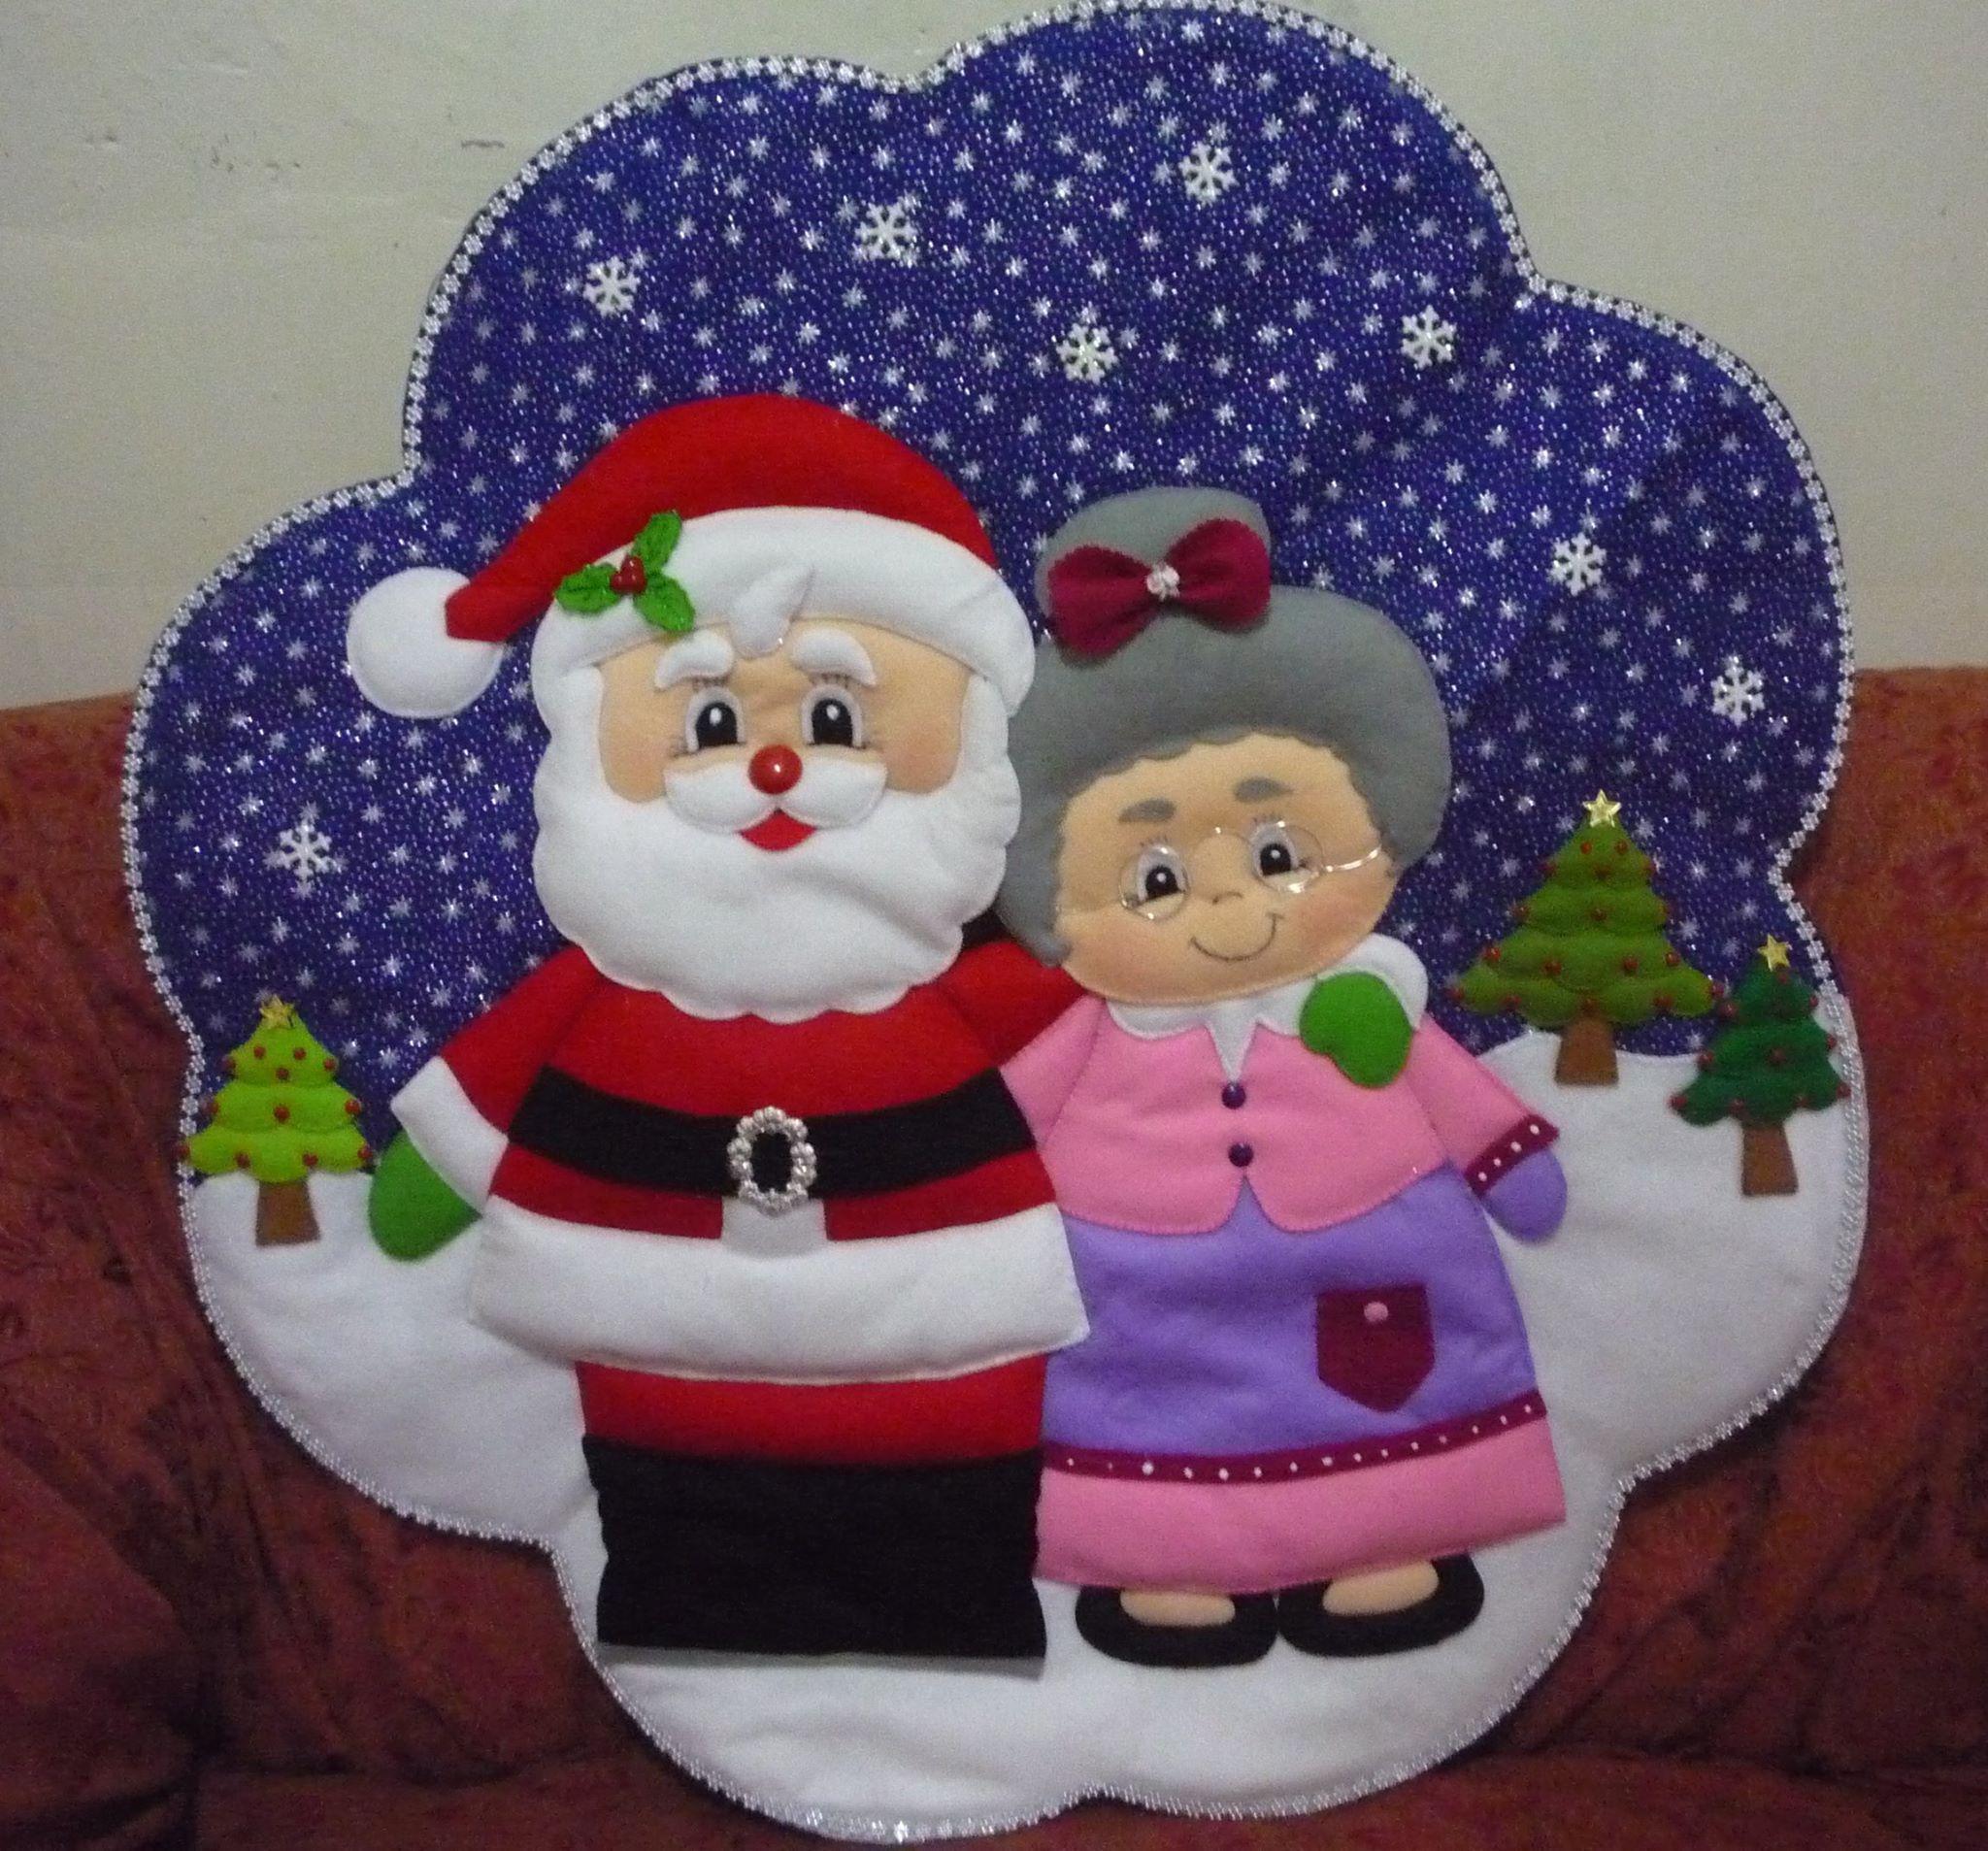 En pa o lency mu ecos pinterest felt ornaments - Cojines de patchwork ...